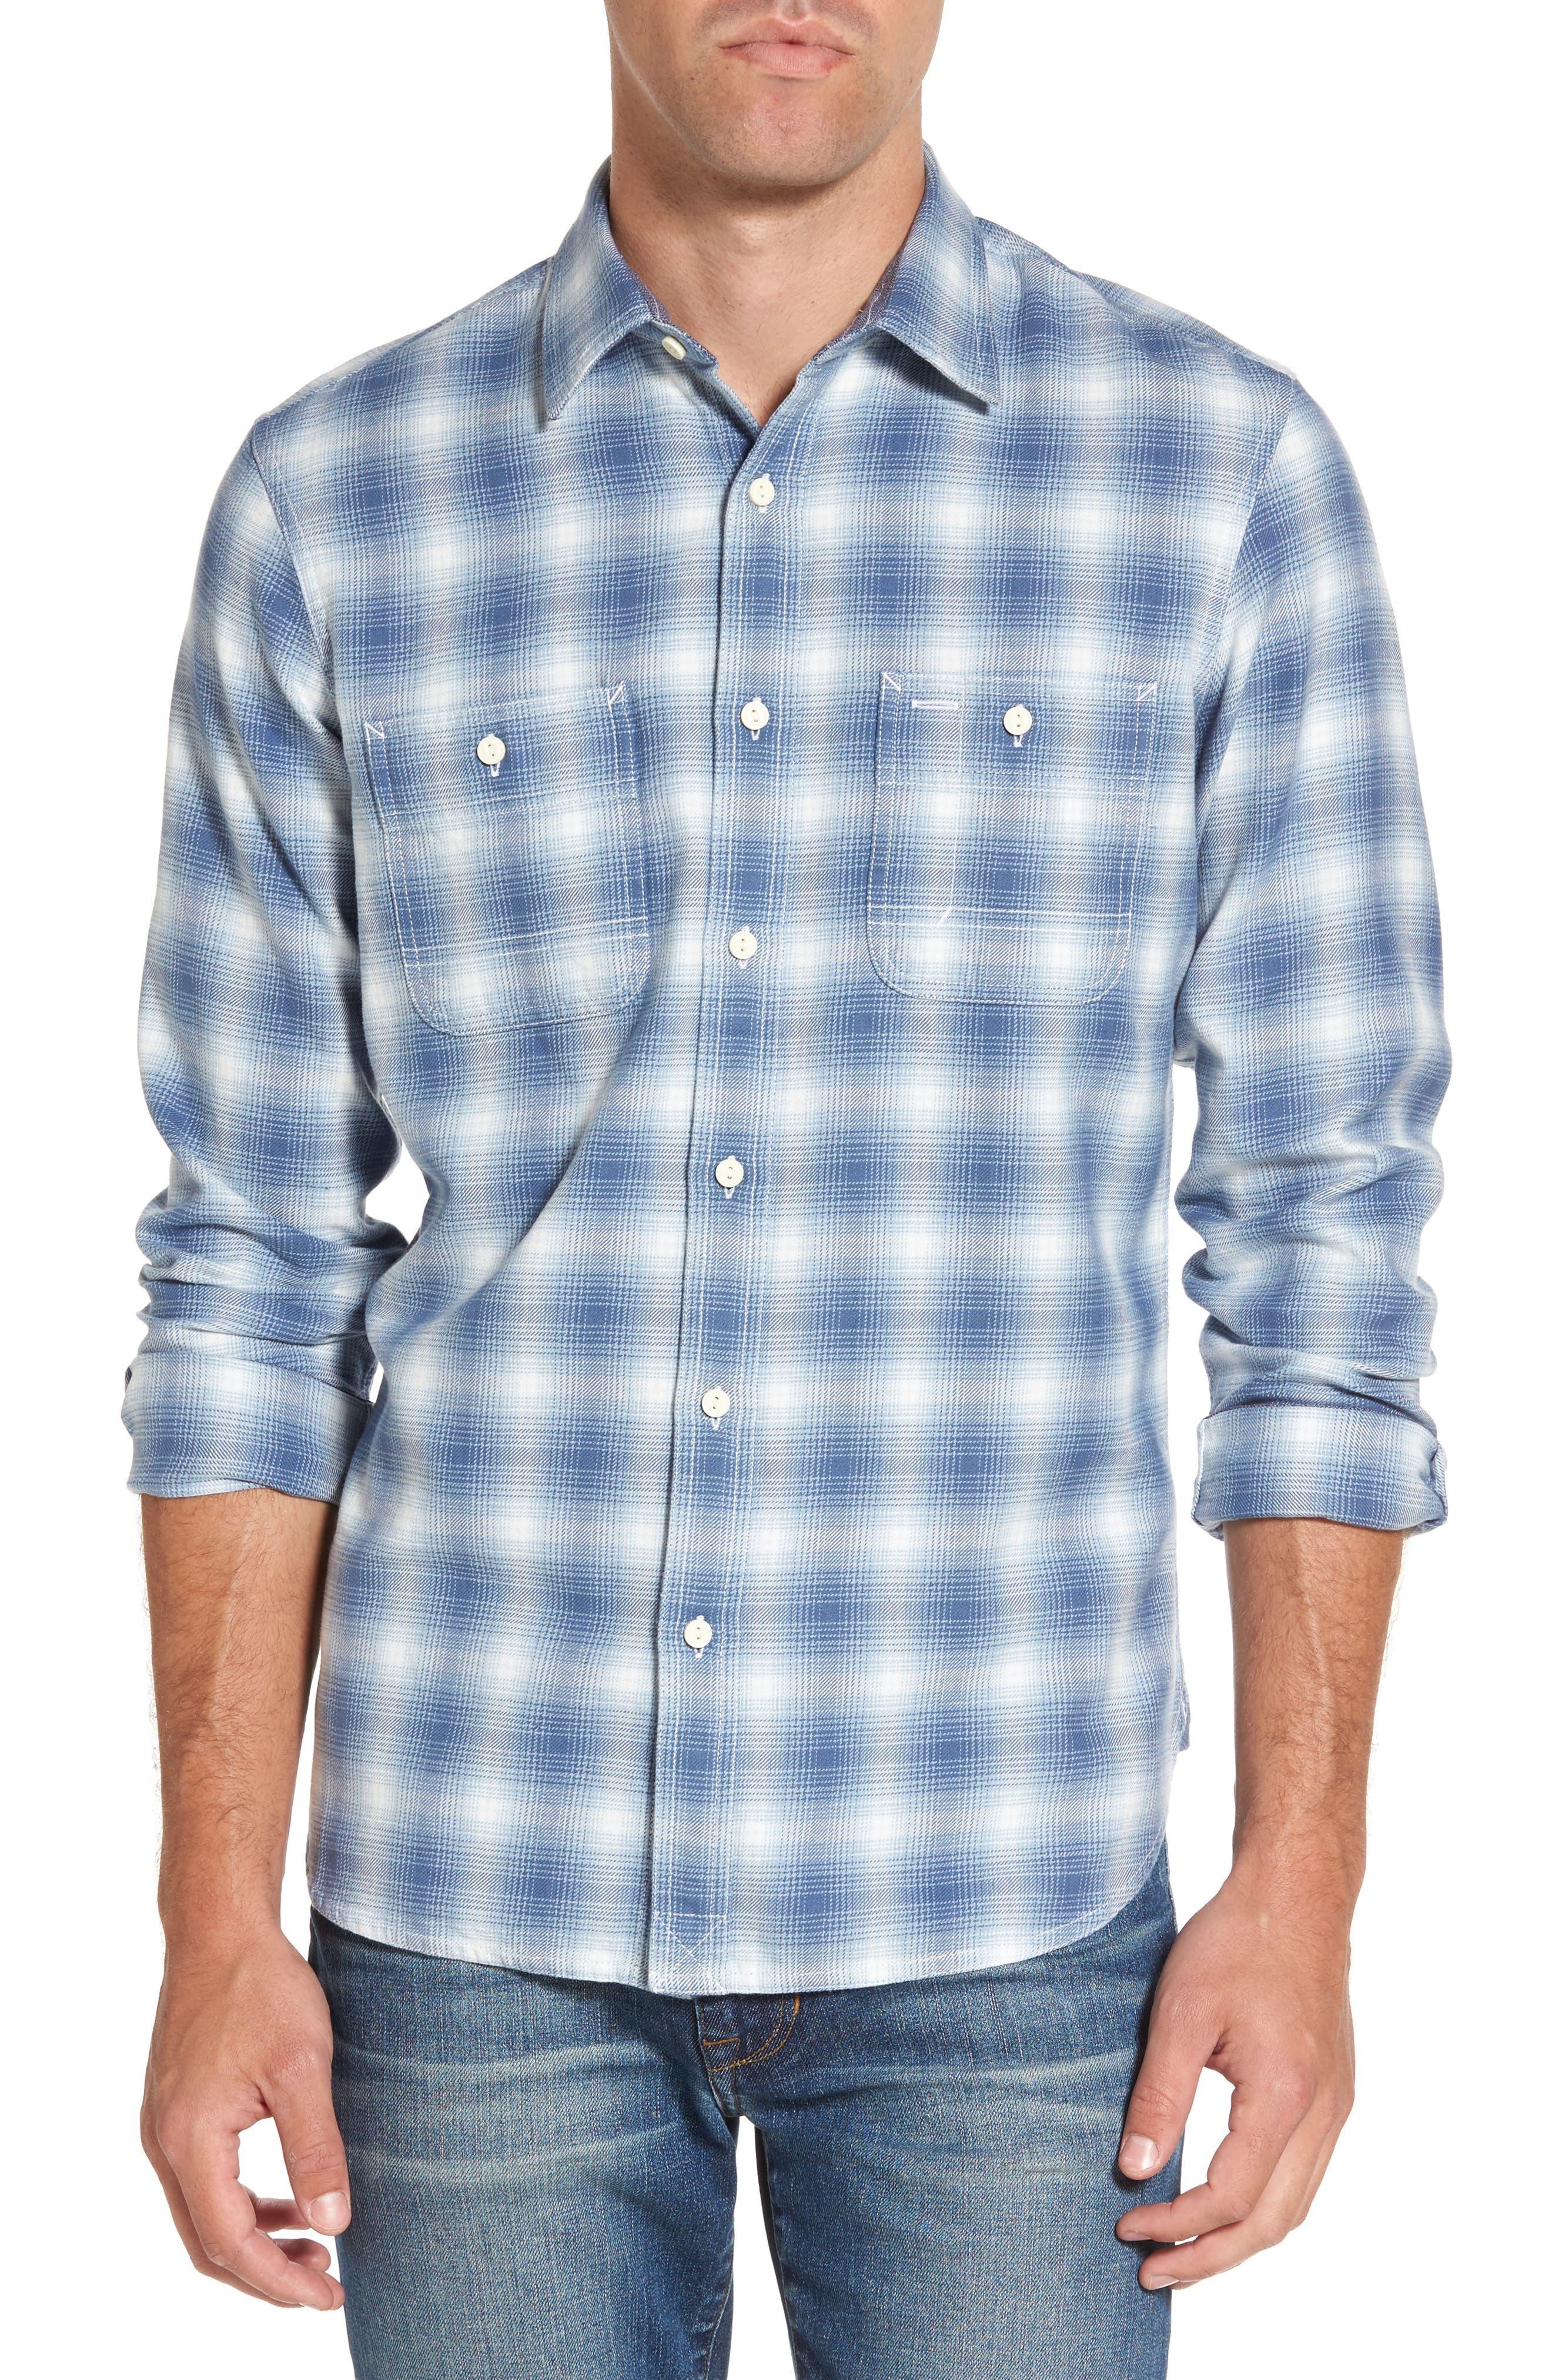 Nordstrom Men's Shop Slim Fit Workwear Plaid Sport Shirt